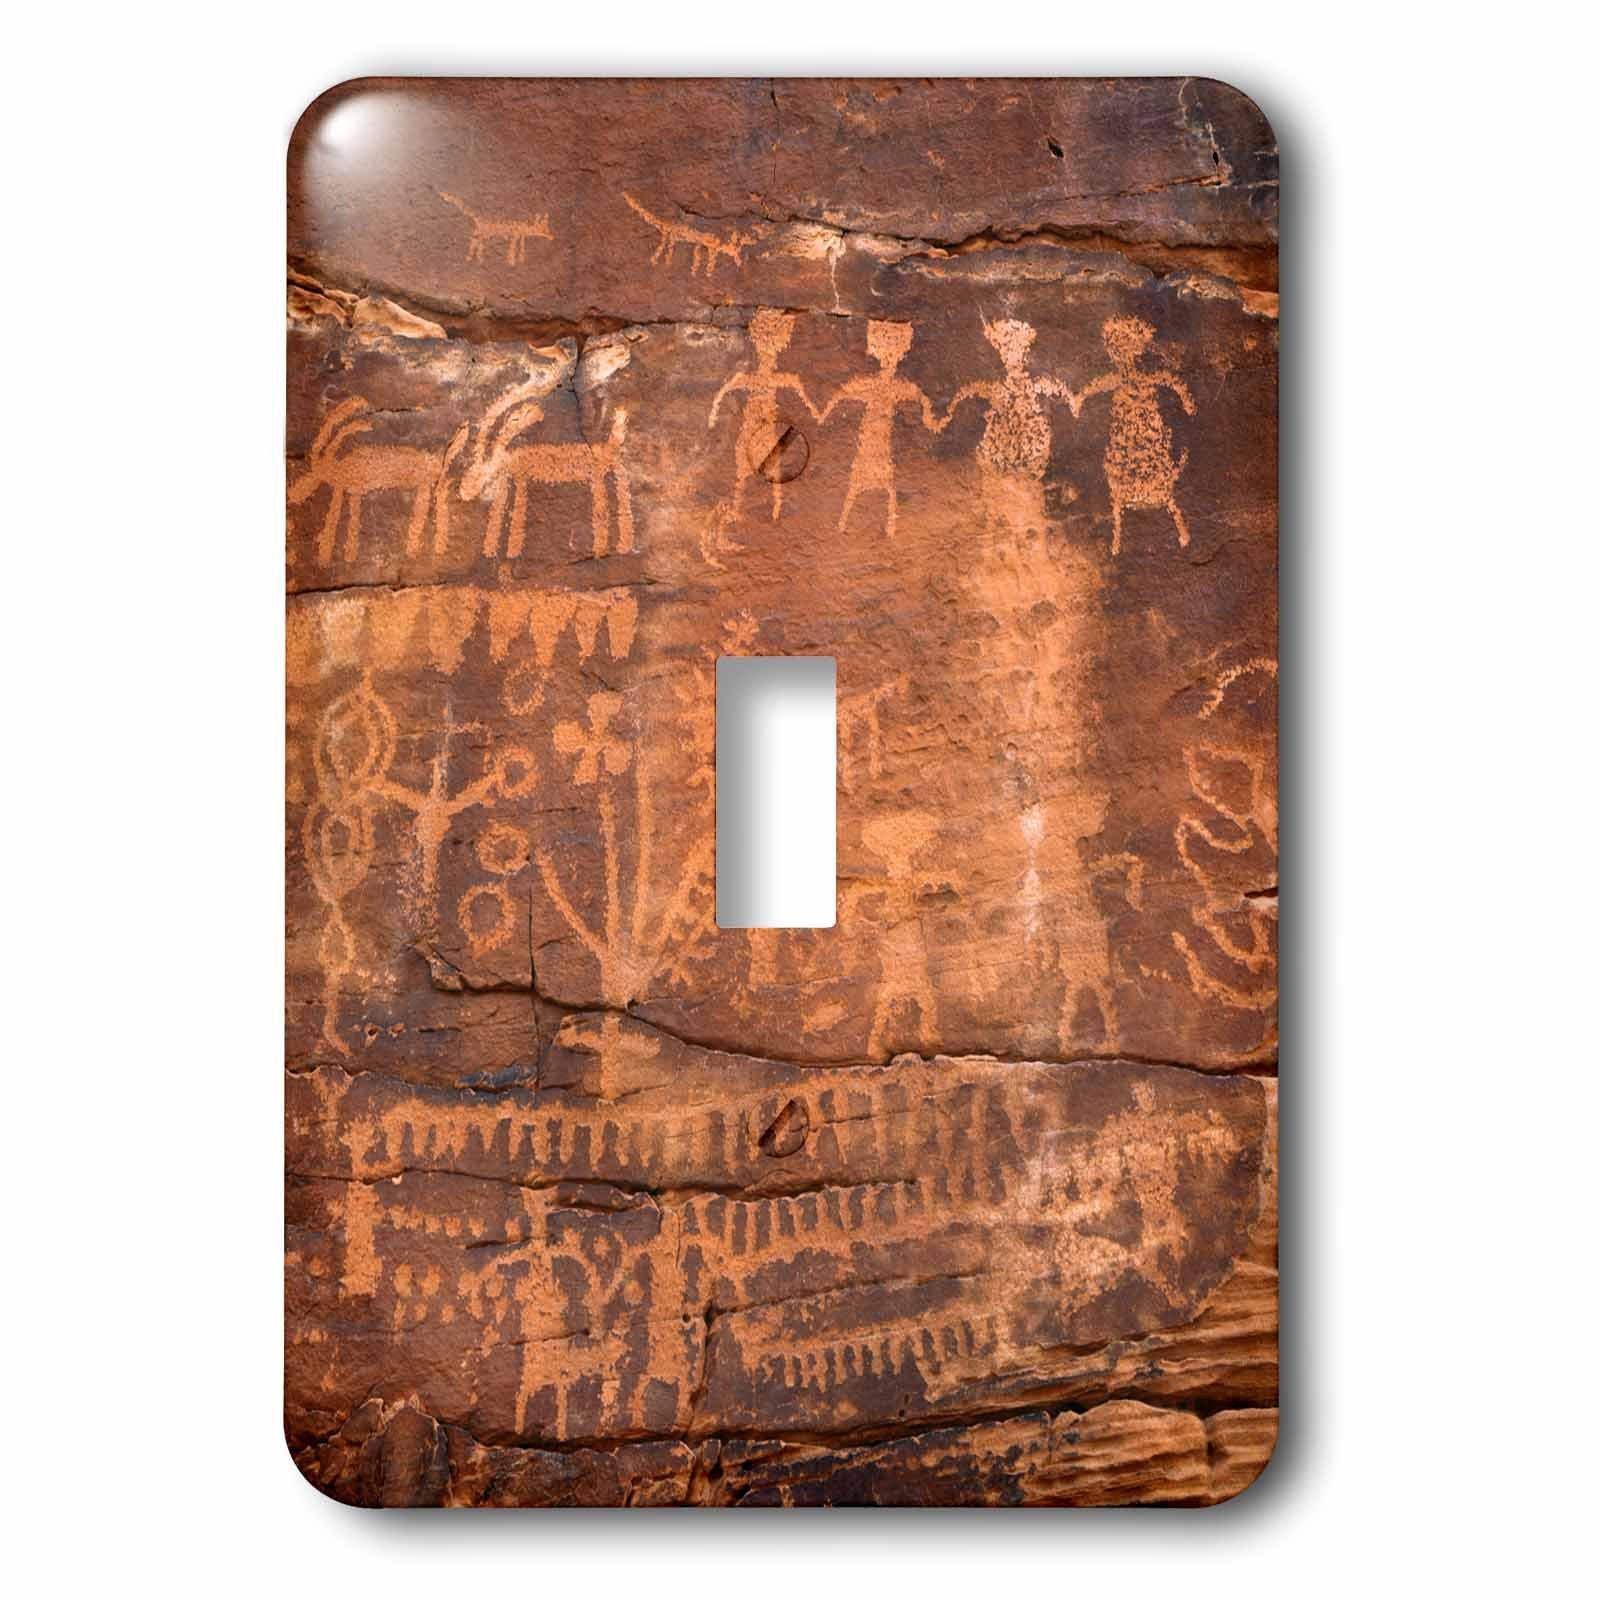 3dRose lsp_228184_1 USA, Southwest, Indian Petroglyphs on Sandstone. Single Toggle Switch